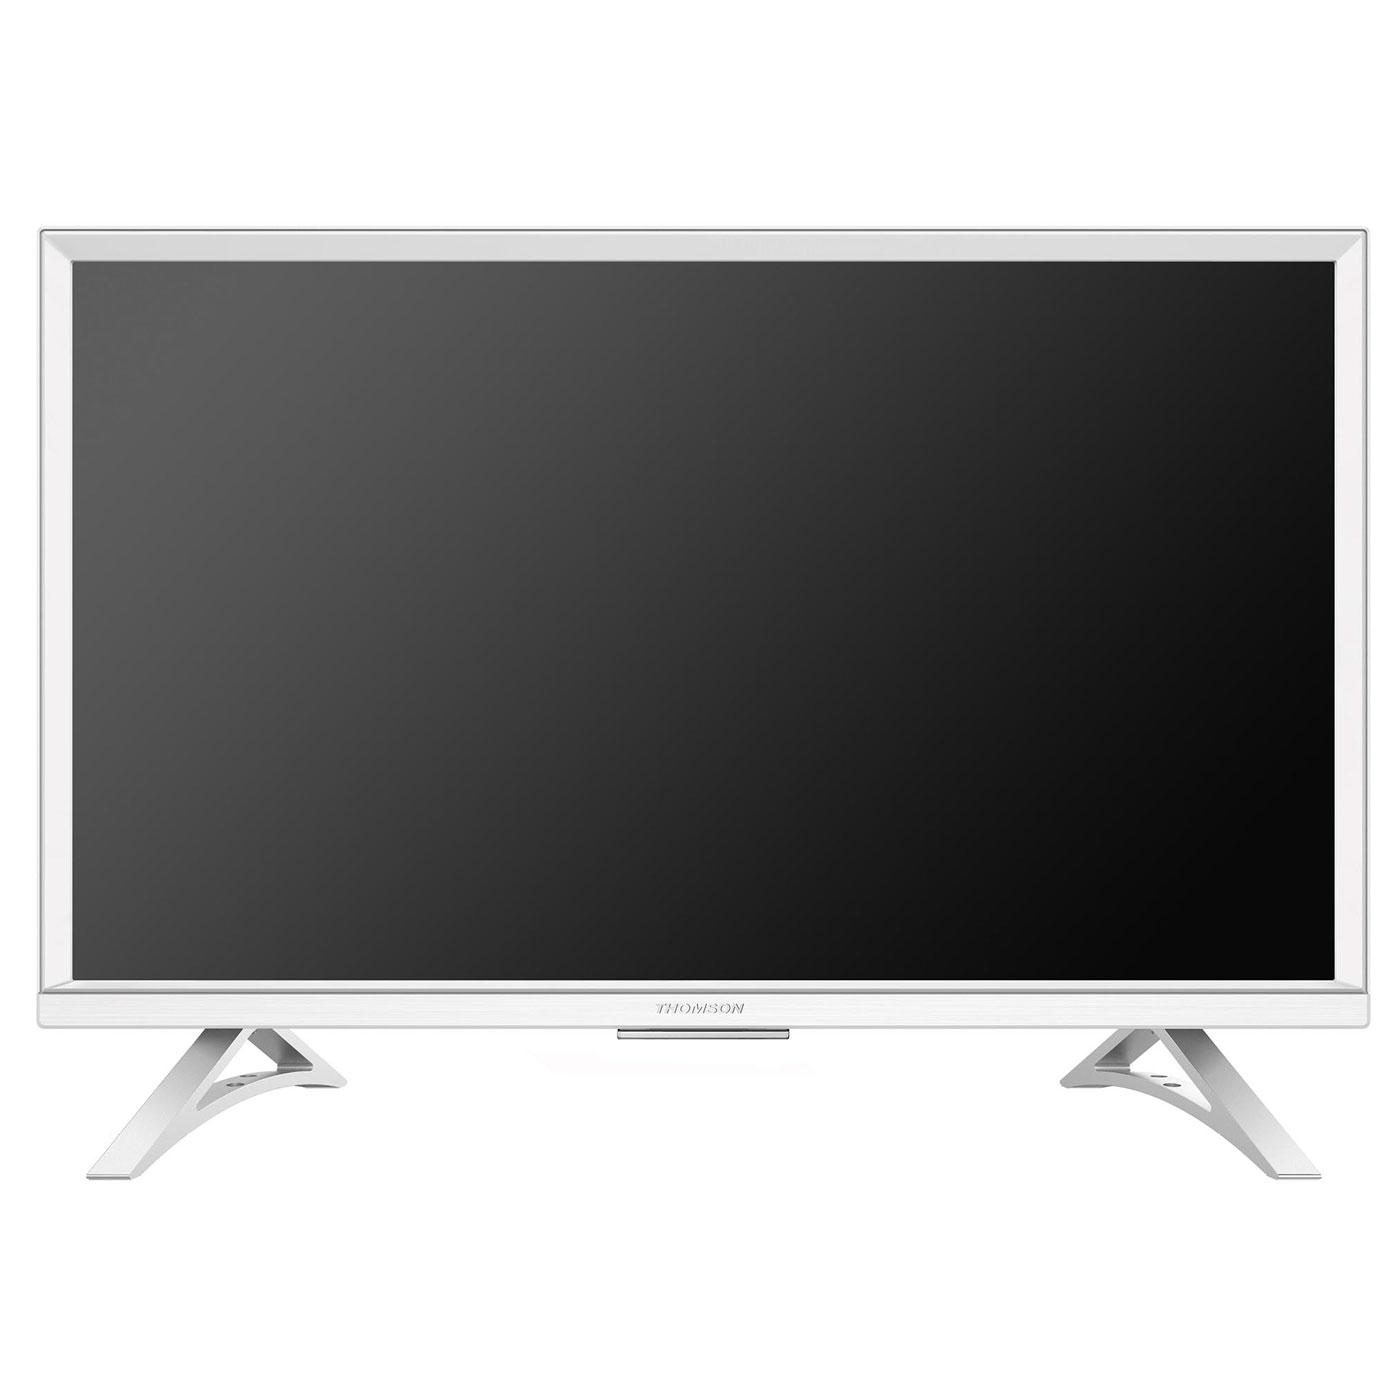 thomson 28ha3223w tv thomson sur. Black Bedroom Furniture Sets. Home Design Ideas